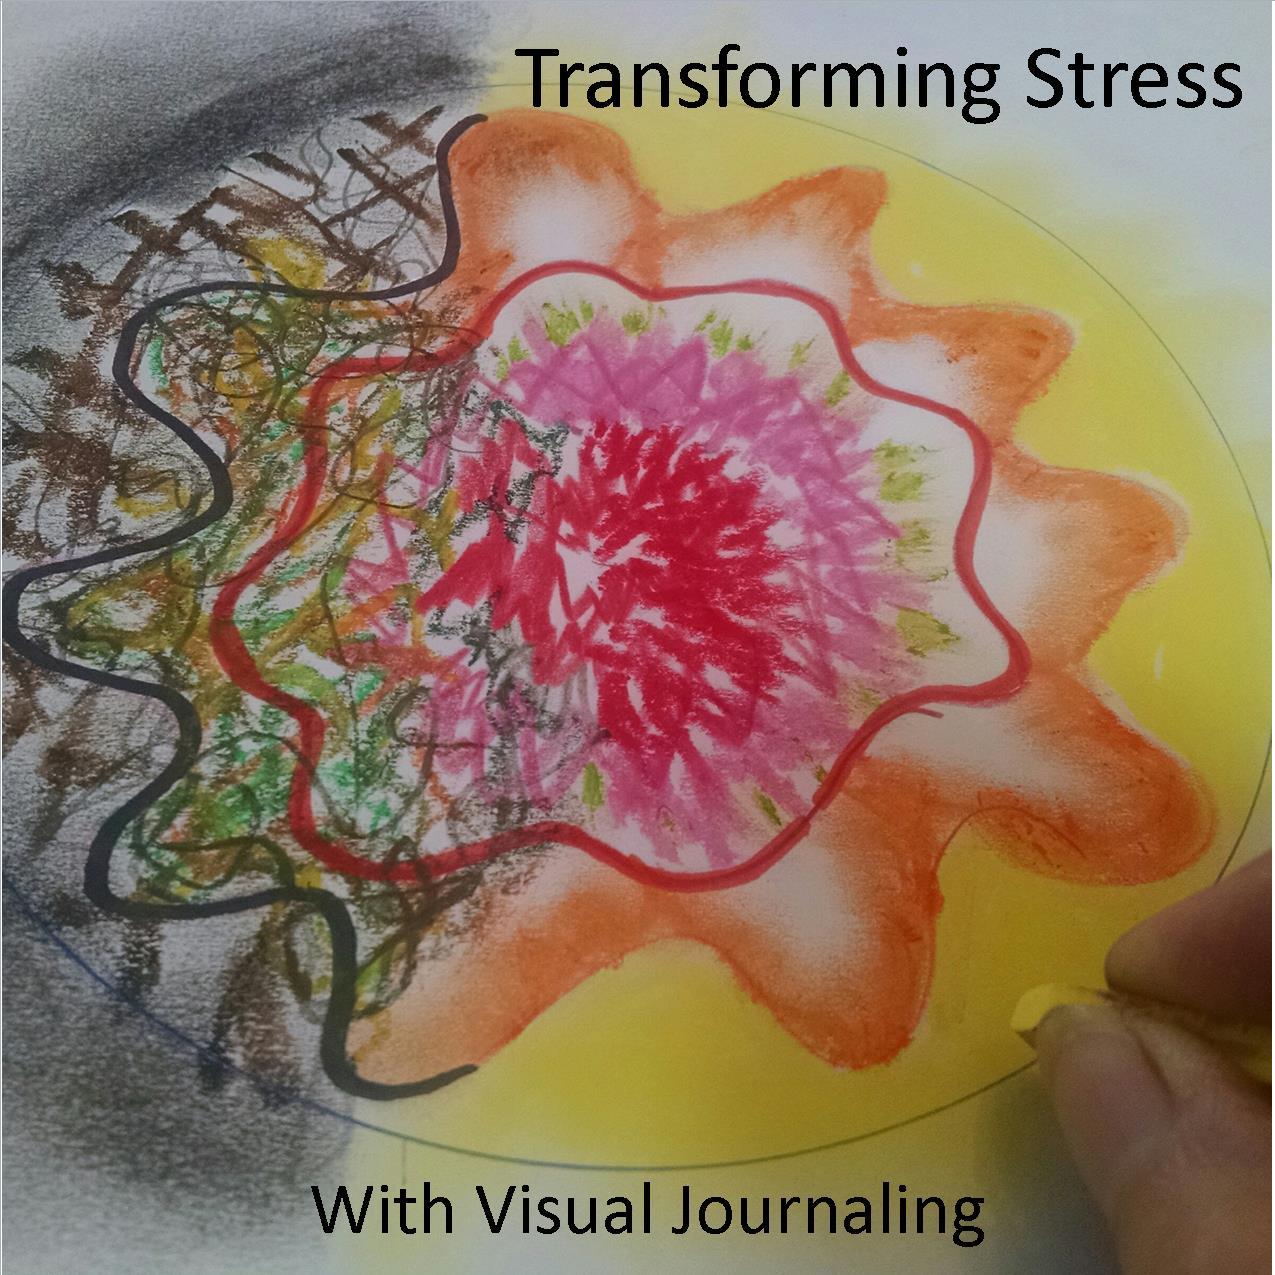 Transforming Stress with Visual Journaling.jpg